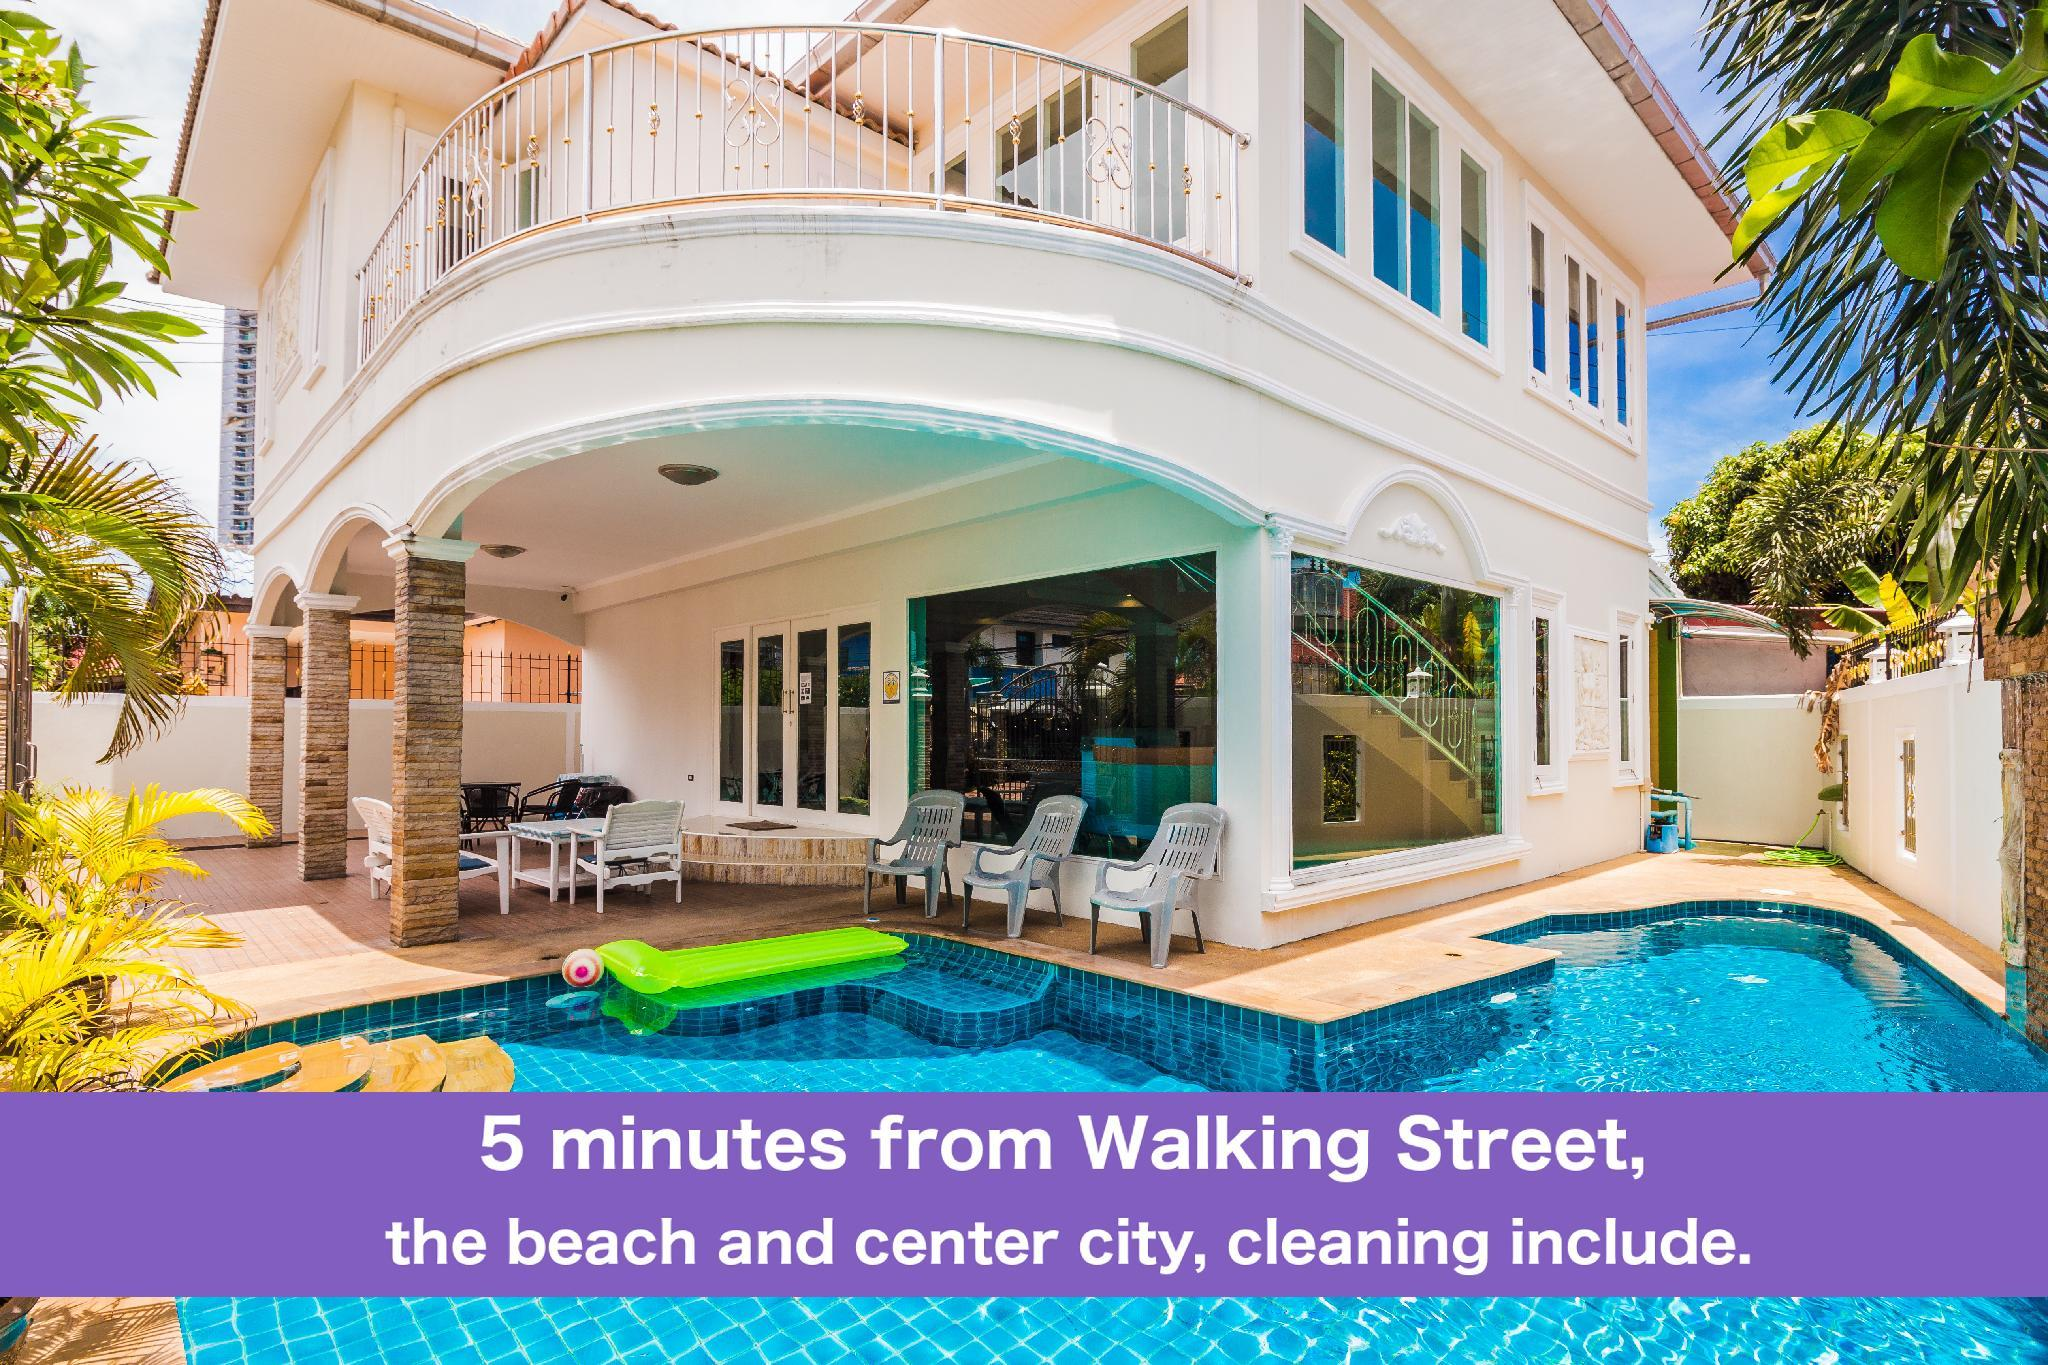 Pool Villa 4 Bedrooms Tewaree 5 Min Walking Street